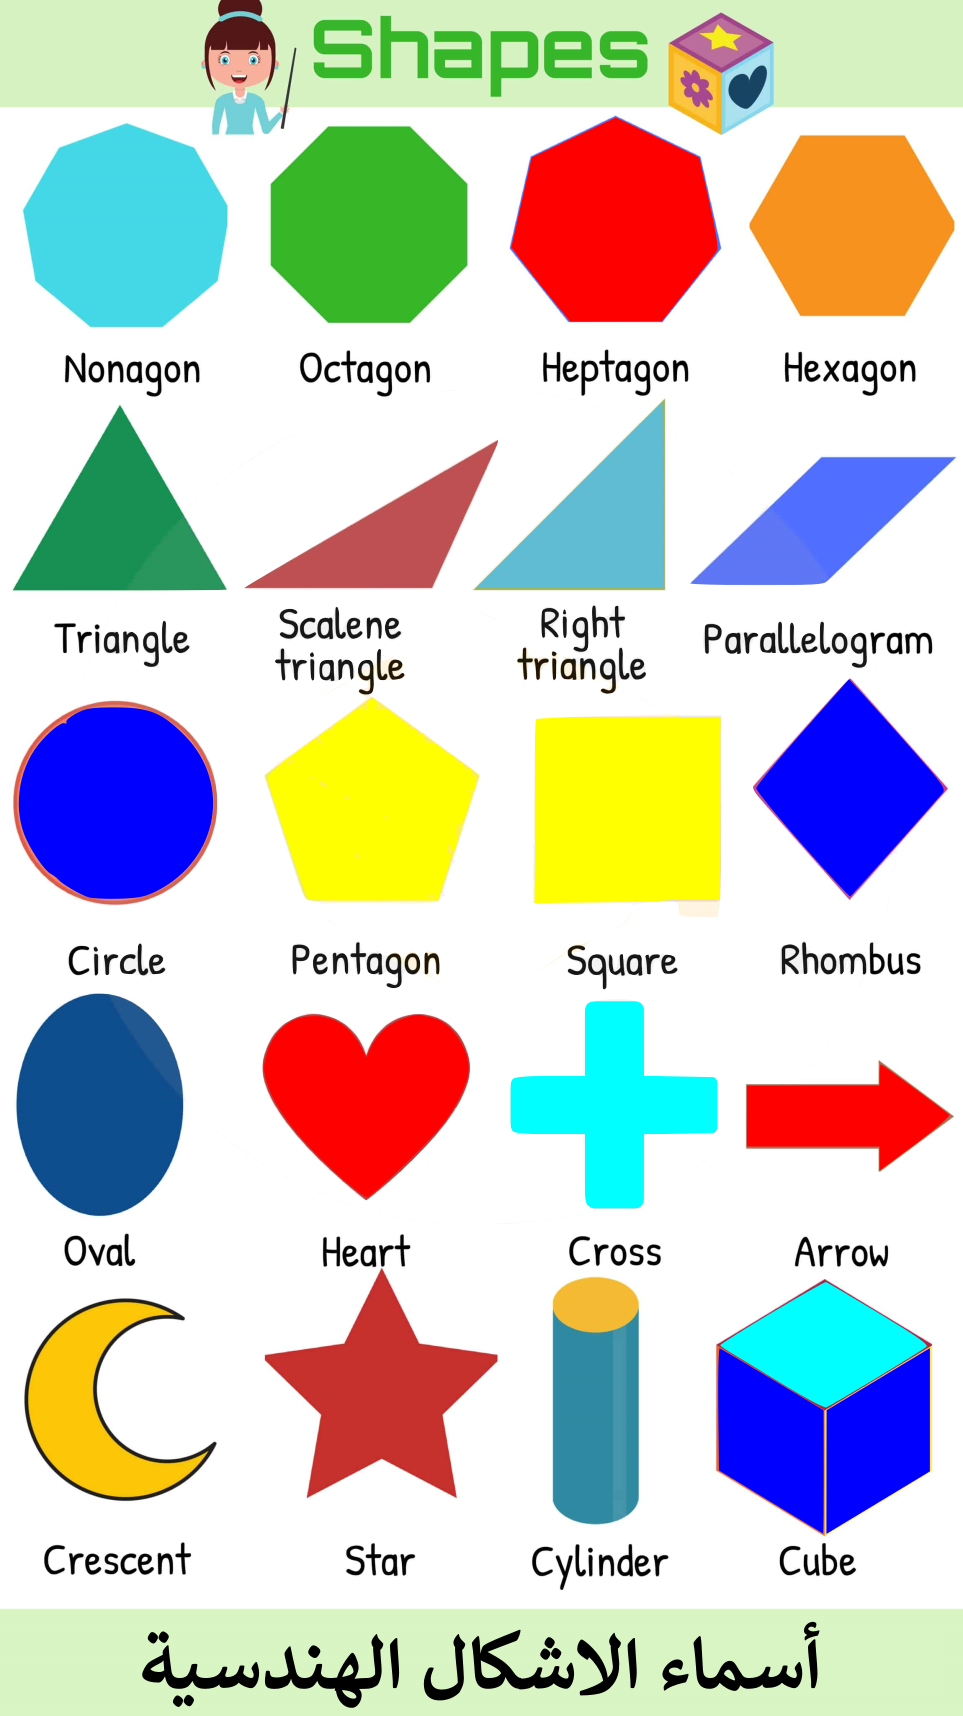 Shapes Vocabulary In English English Vocabulary Shapes Vocabulary